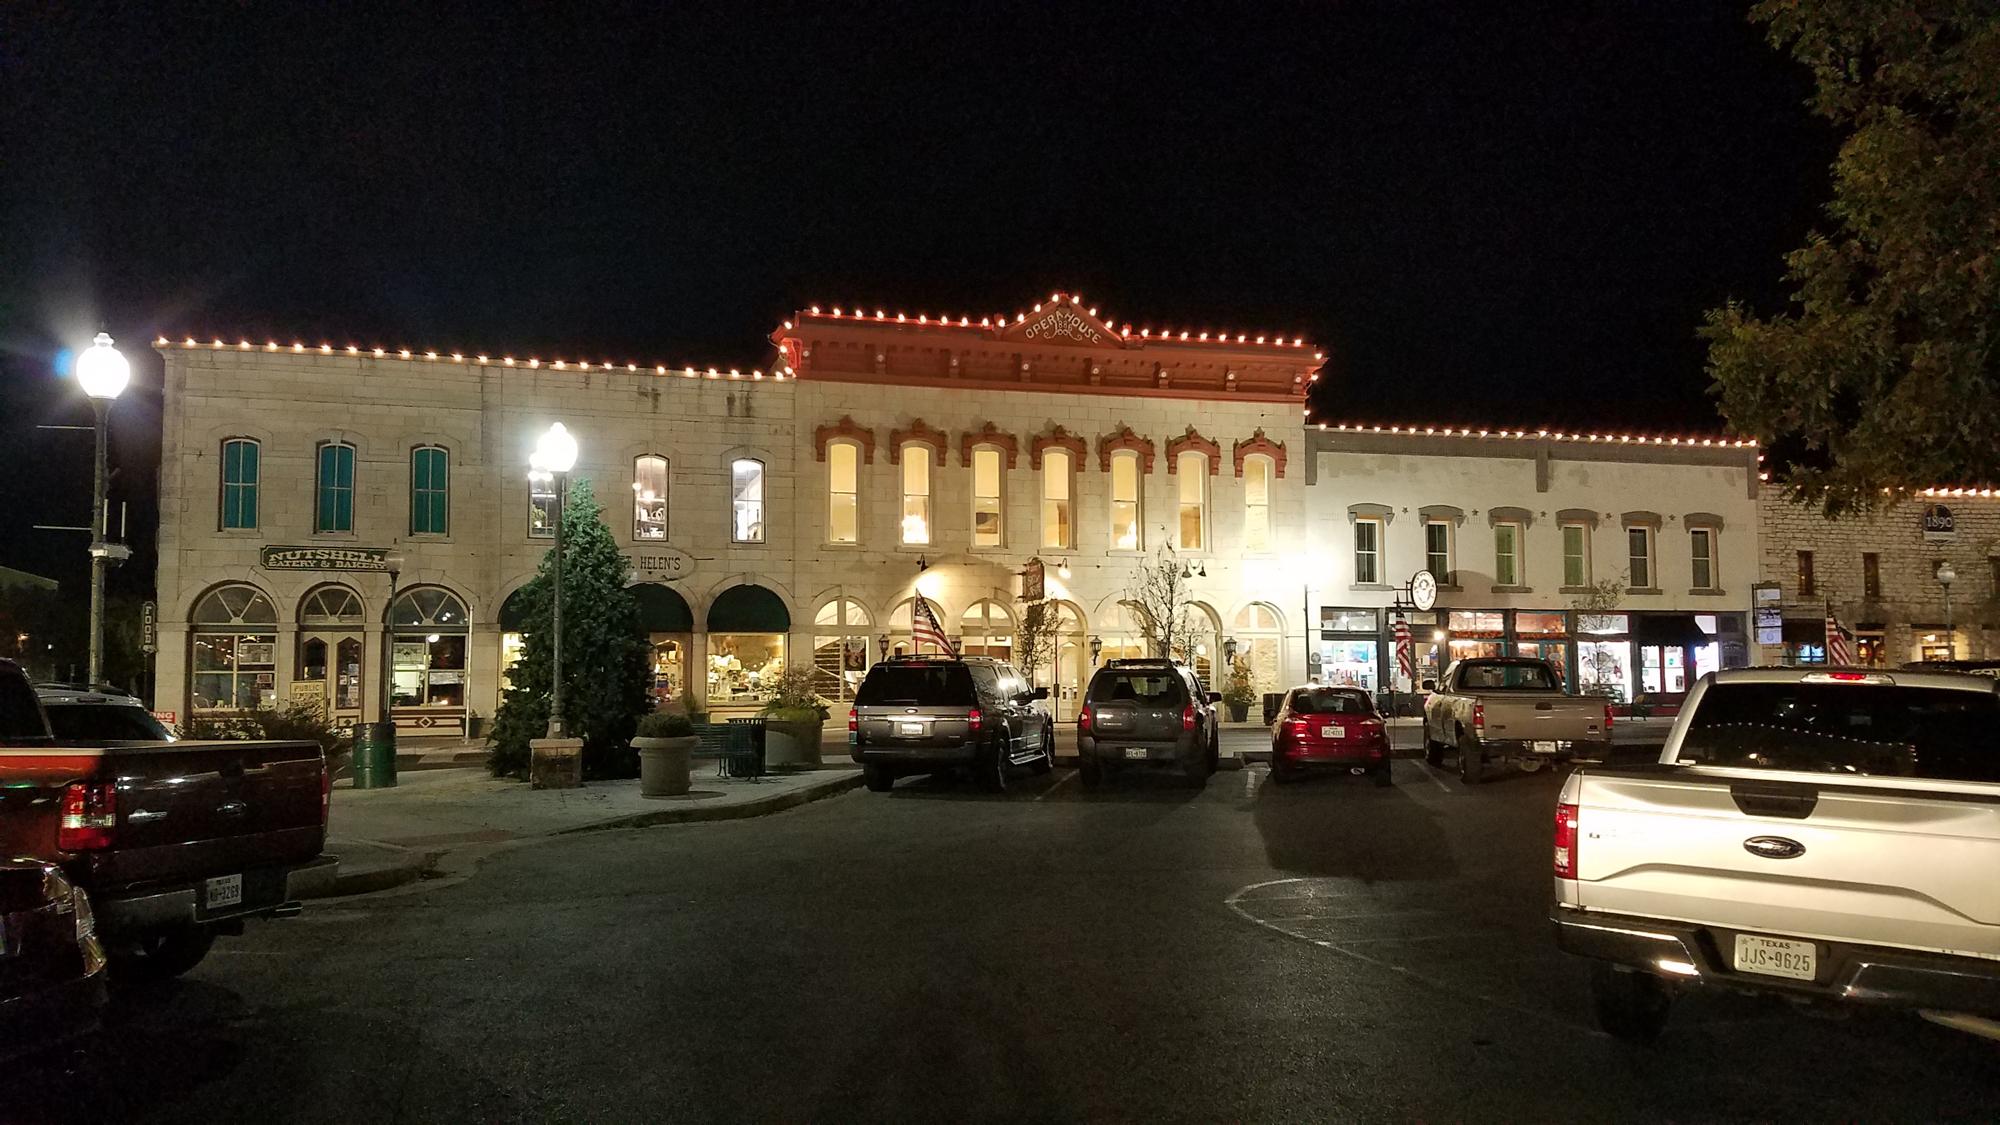 Granbury Texas Historic Downtown Square